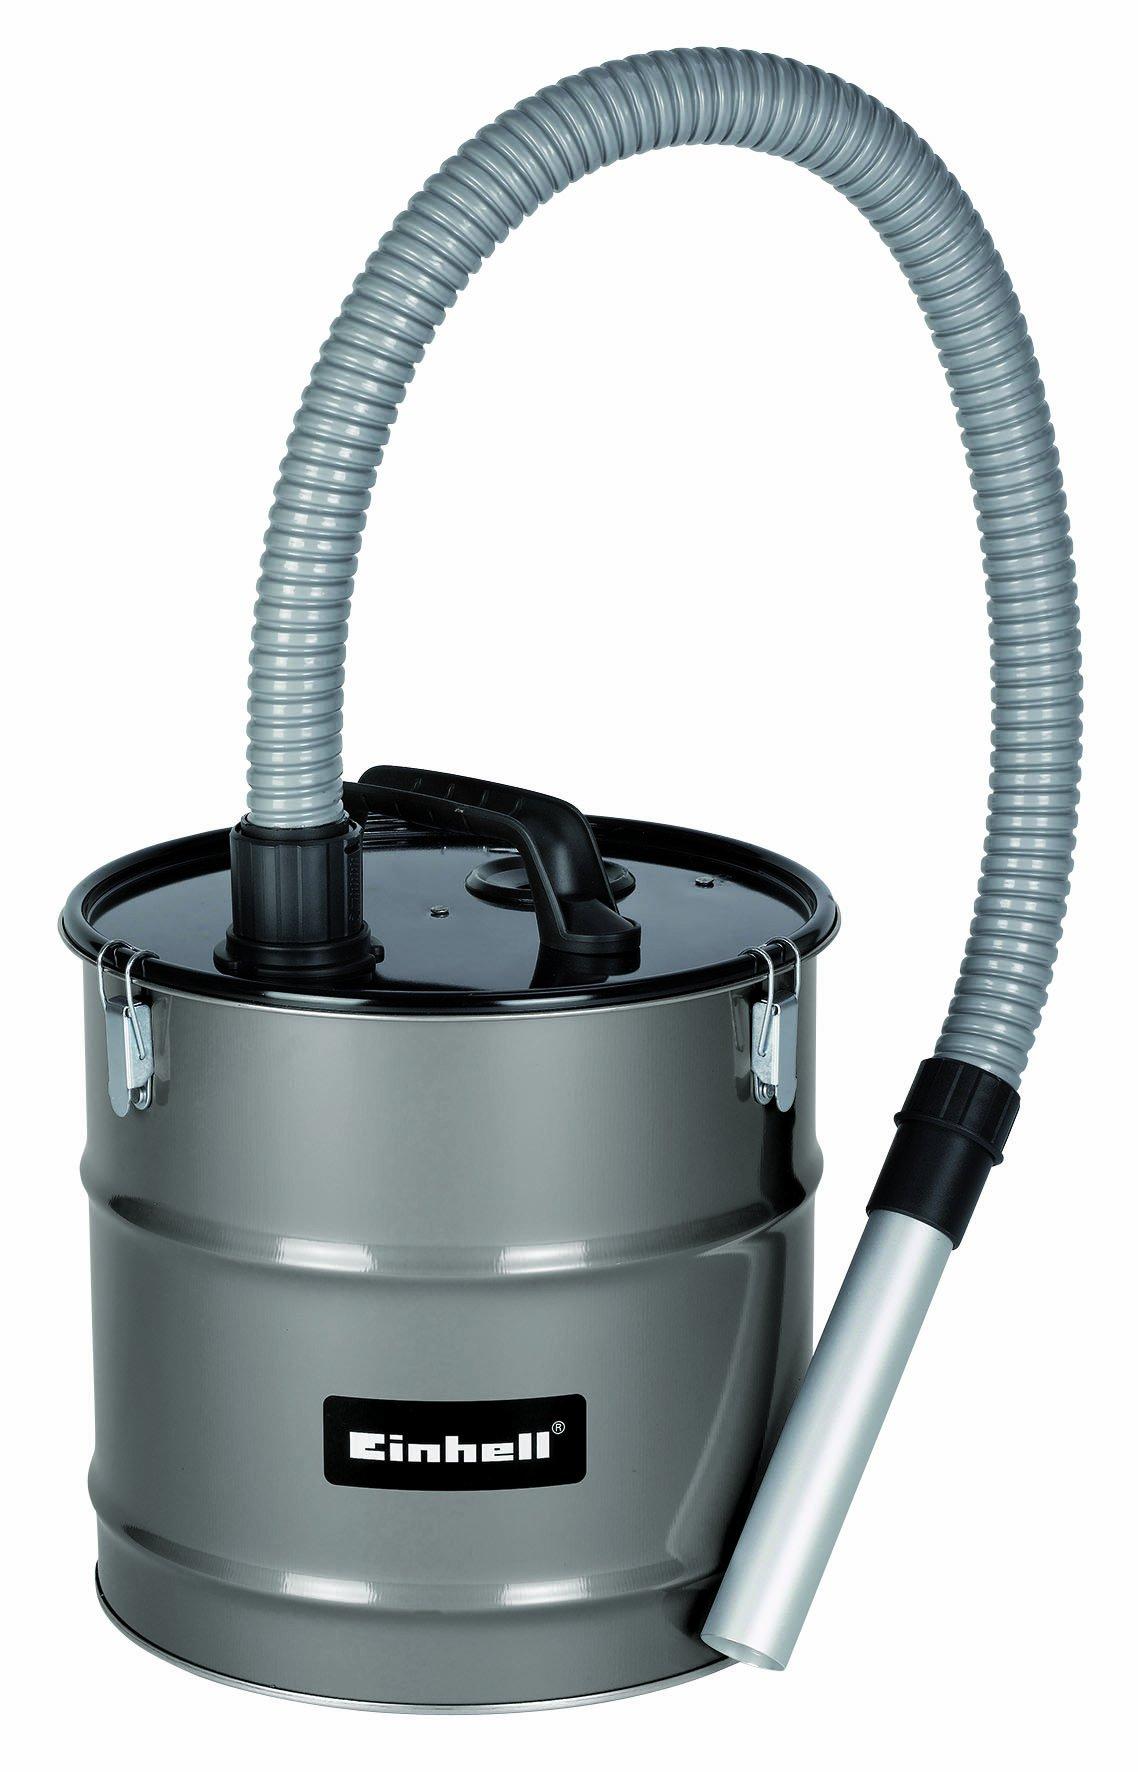 Einhell AFF 18 FITRO Especial CHIMENEAS Alta Calidad, 18 Liters, aluminio, Negro, Gris